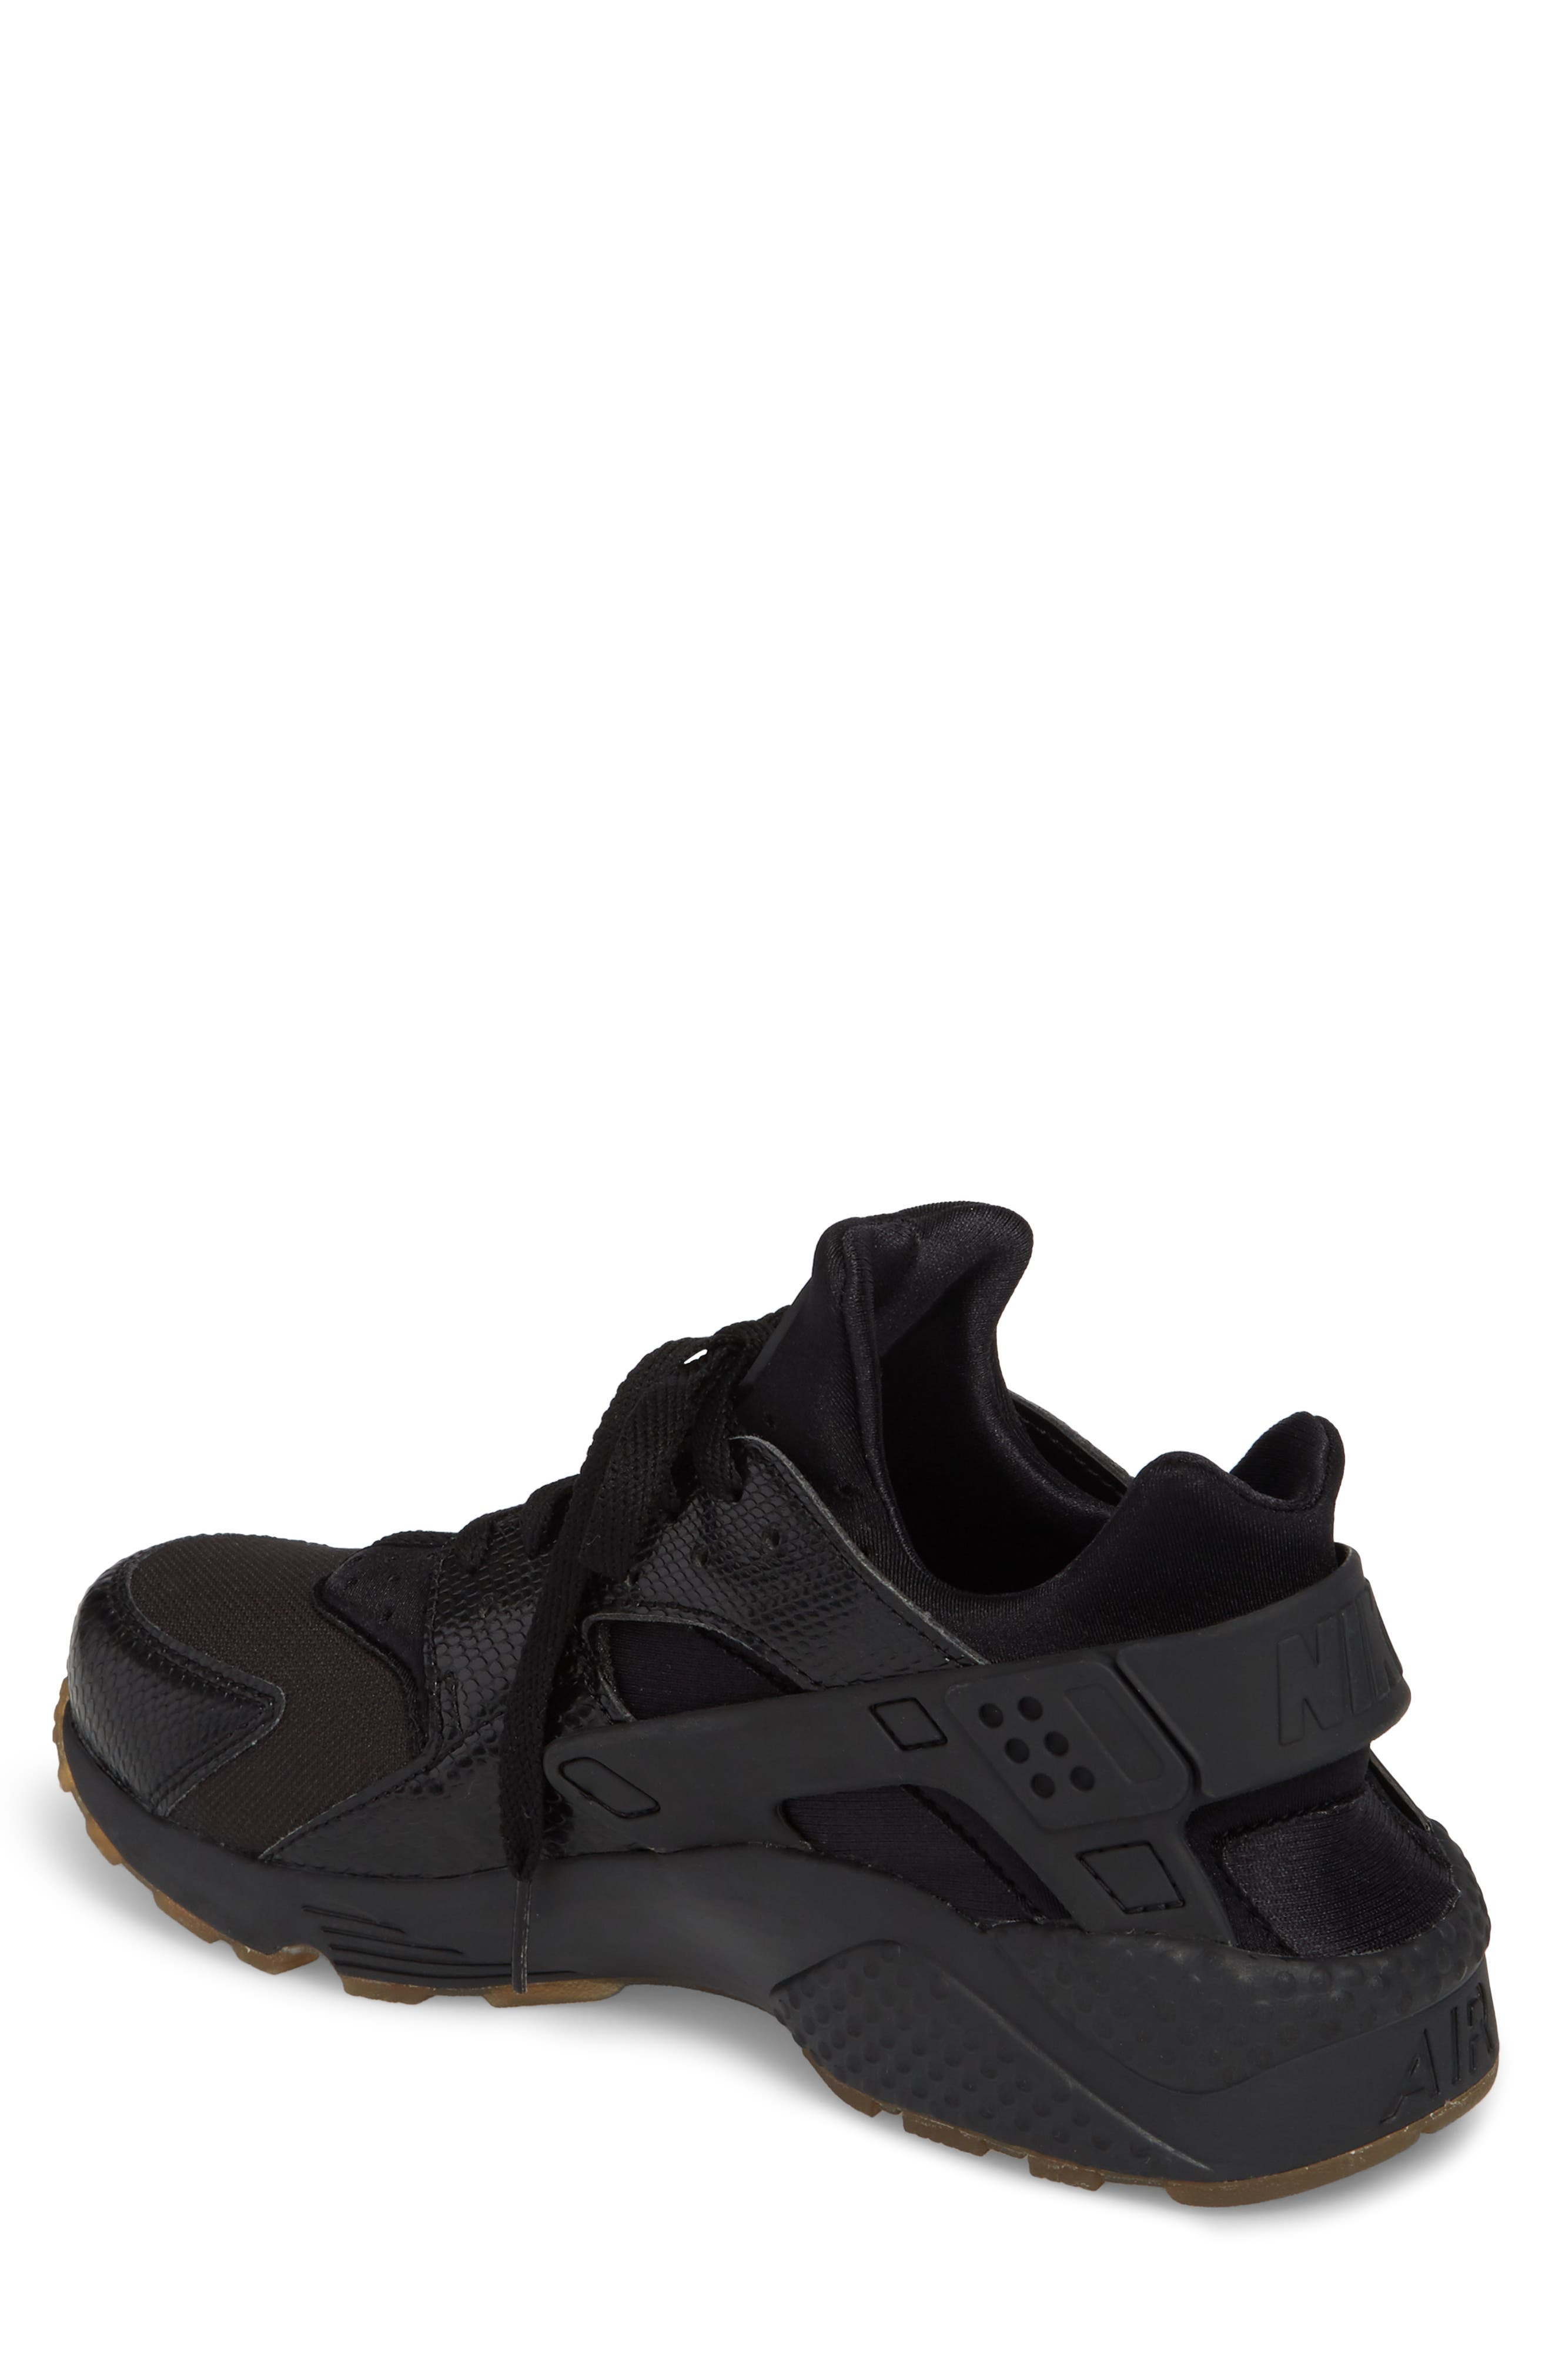 'Air Huarache' Sneaker,                             Alternate thumbnail 2, color,                             Black/ Elemental Gold/ Brown